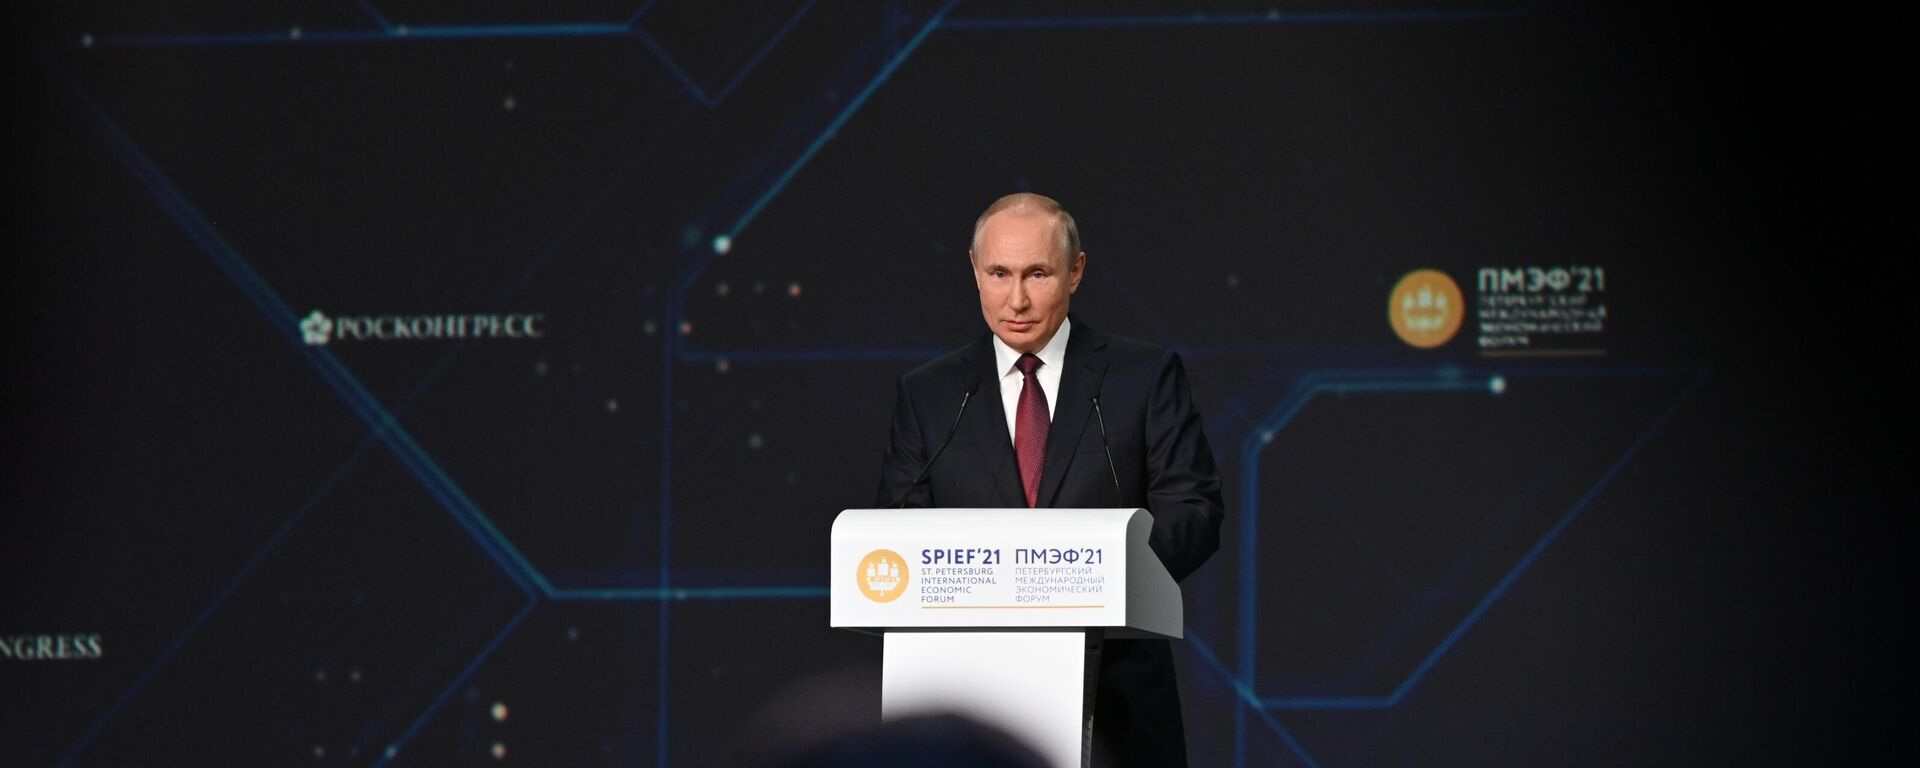 Russlands Präsident Wladimir Putin beim St. Petersburger Wirtschaftsforum, 4. Juni 2021 - SNA, 1920, 04.06.2021